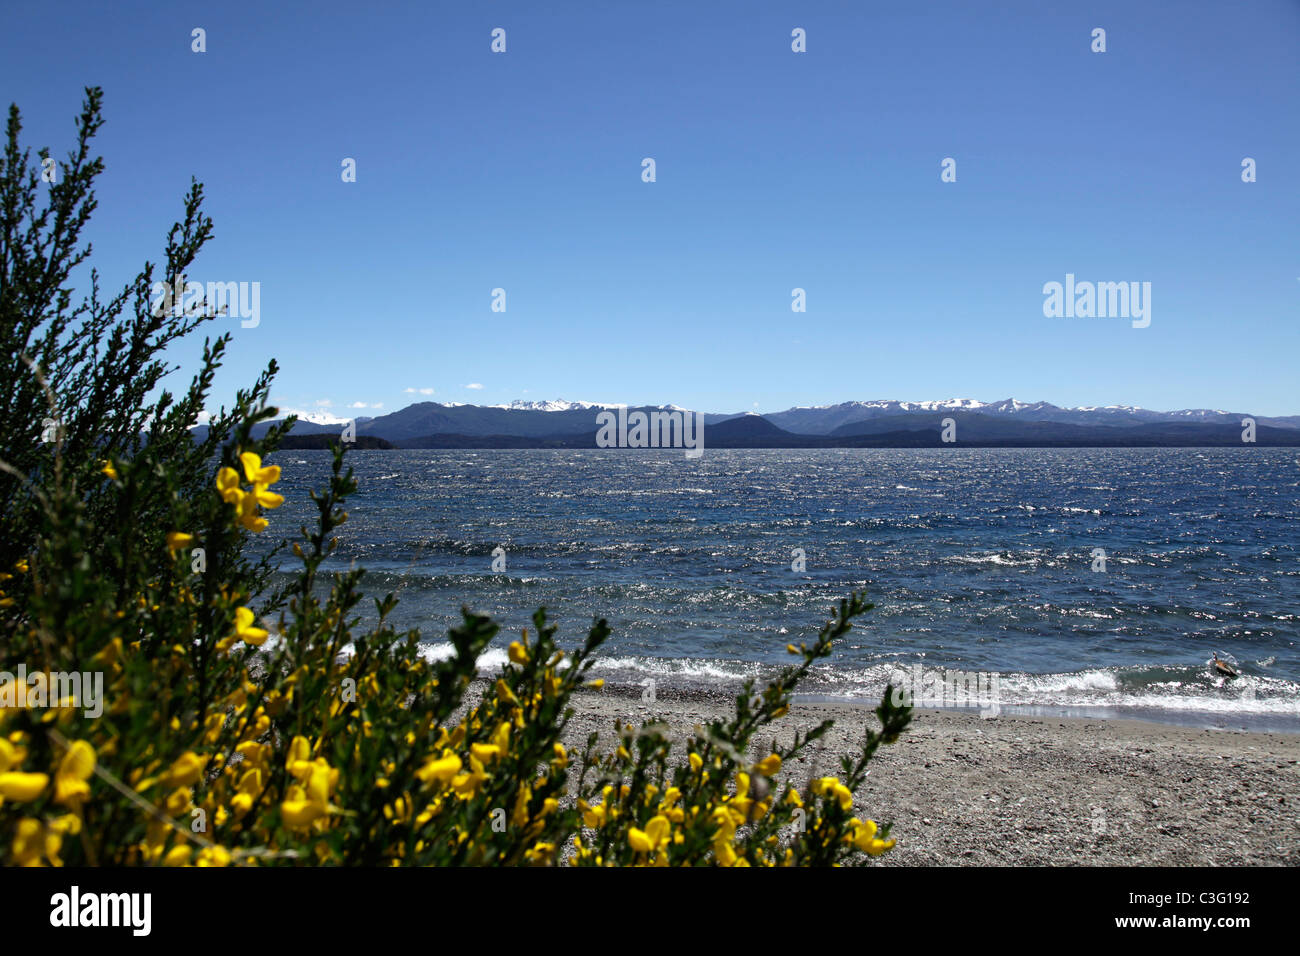 View of Lake Nahuel Huapi from San Carlos de Bariloche, Patagonia, Argentina, South America. - Stock Image